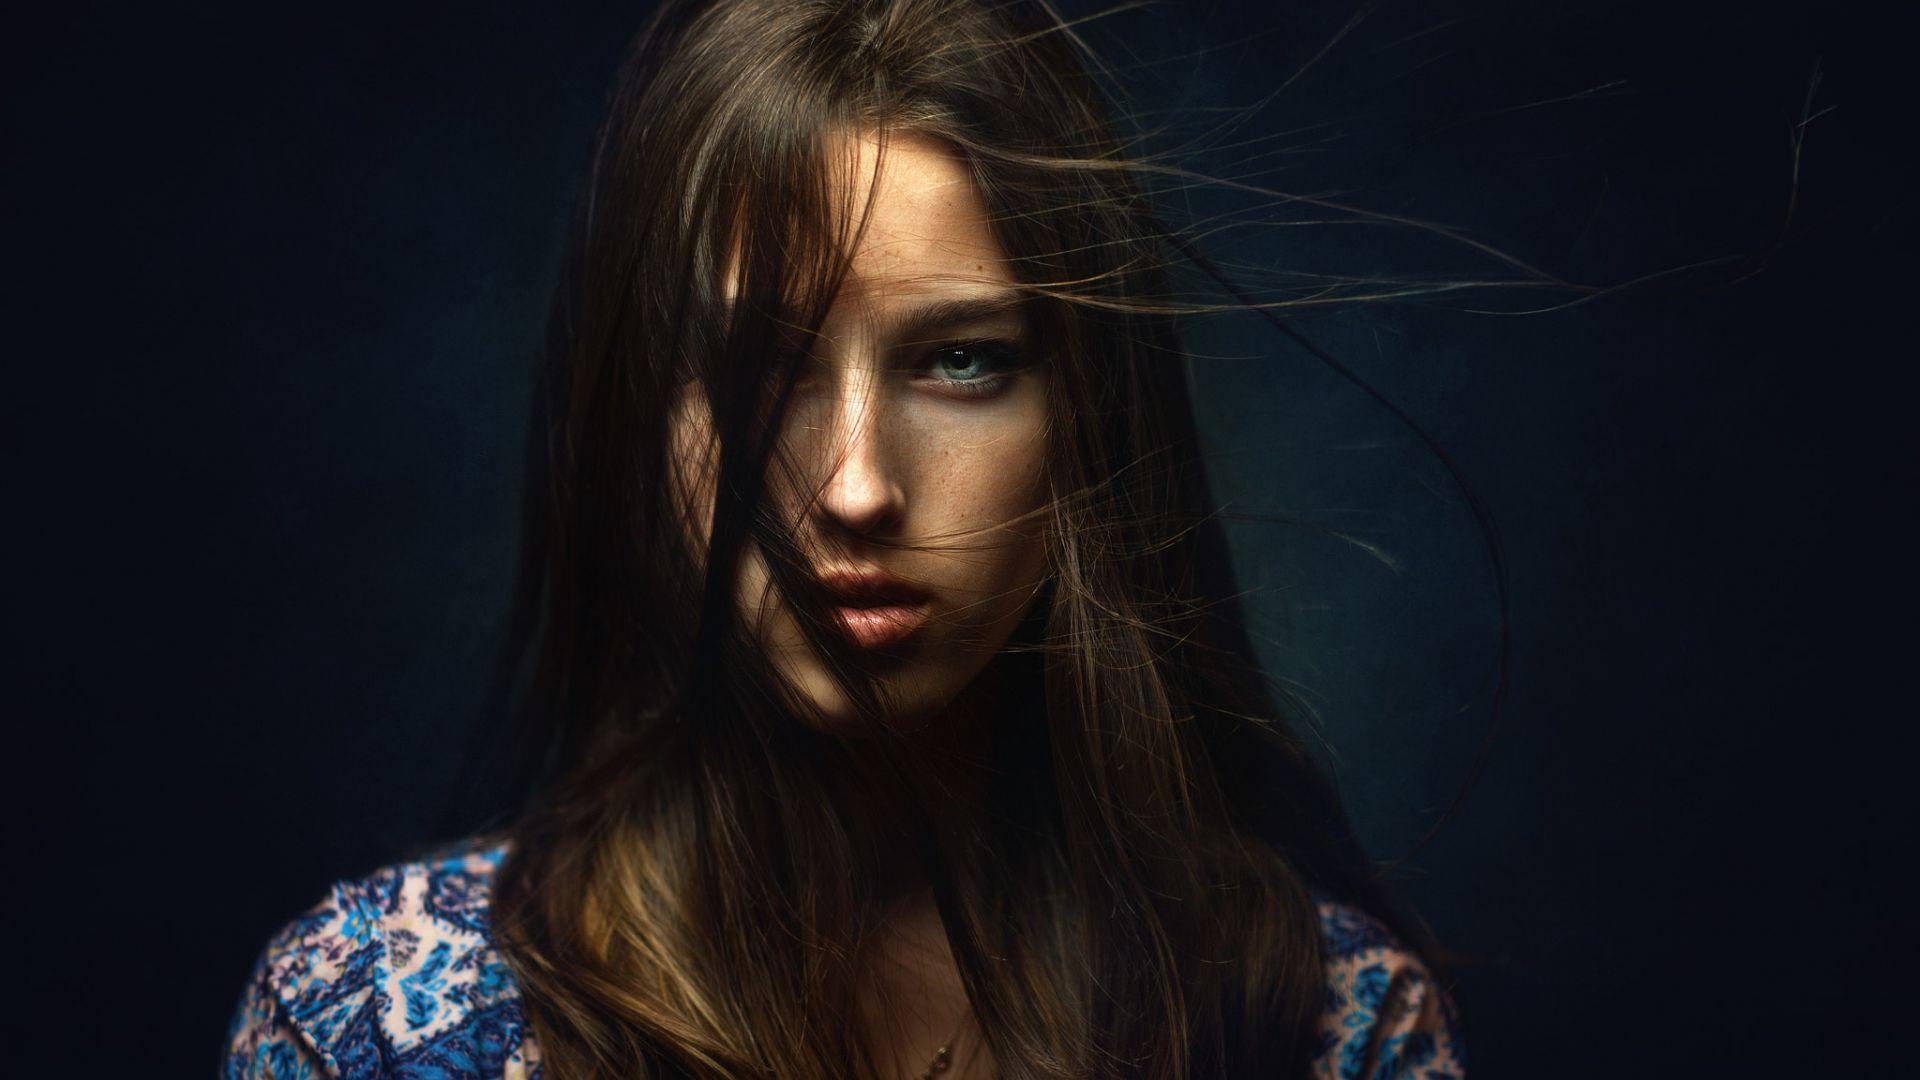 Wallpaper Brunette woman, hair on face